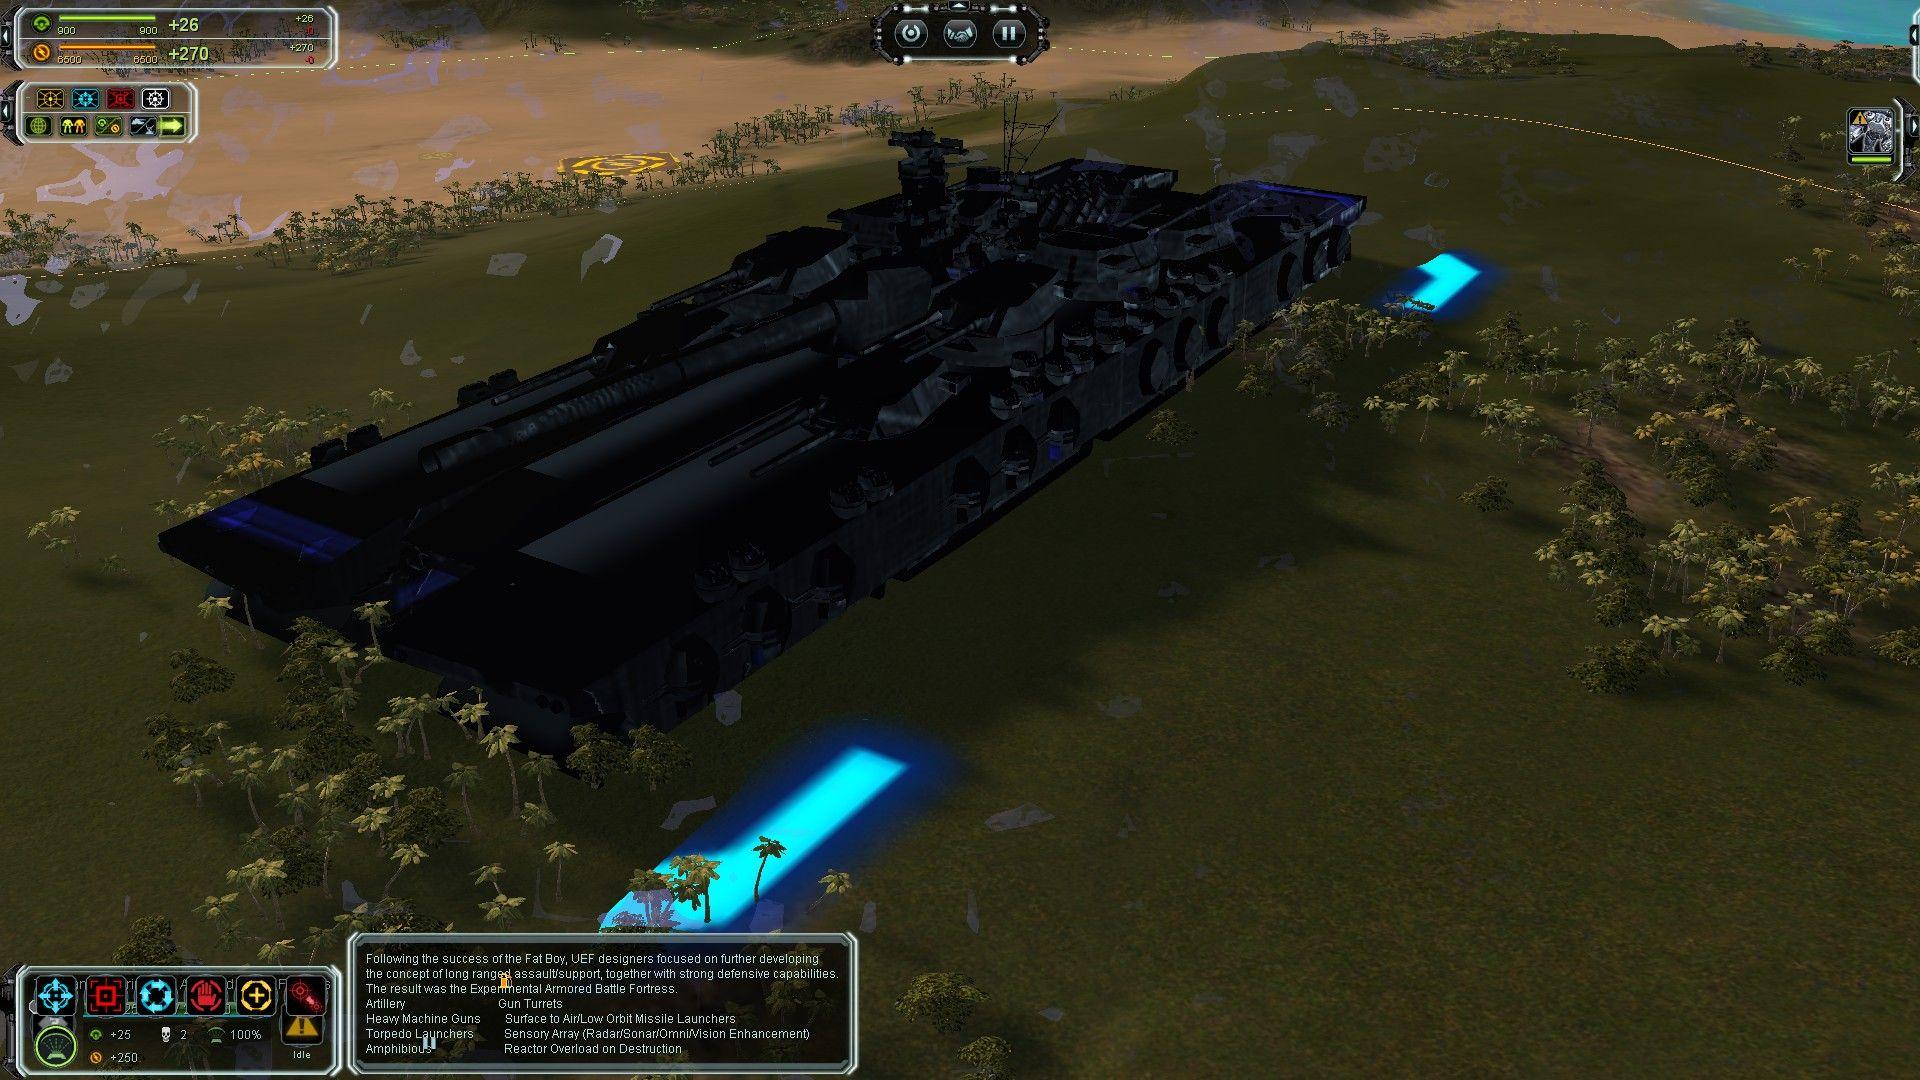 Supreme Commander Mod (WIP) - Land Battleship-SupCom  By ROBOTECH2140